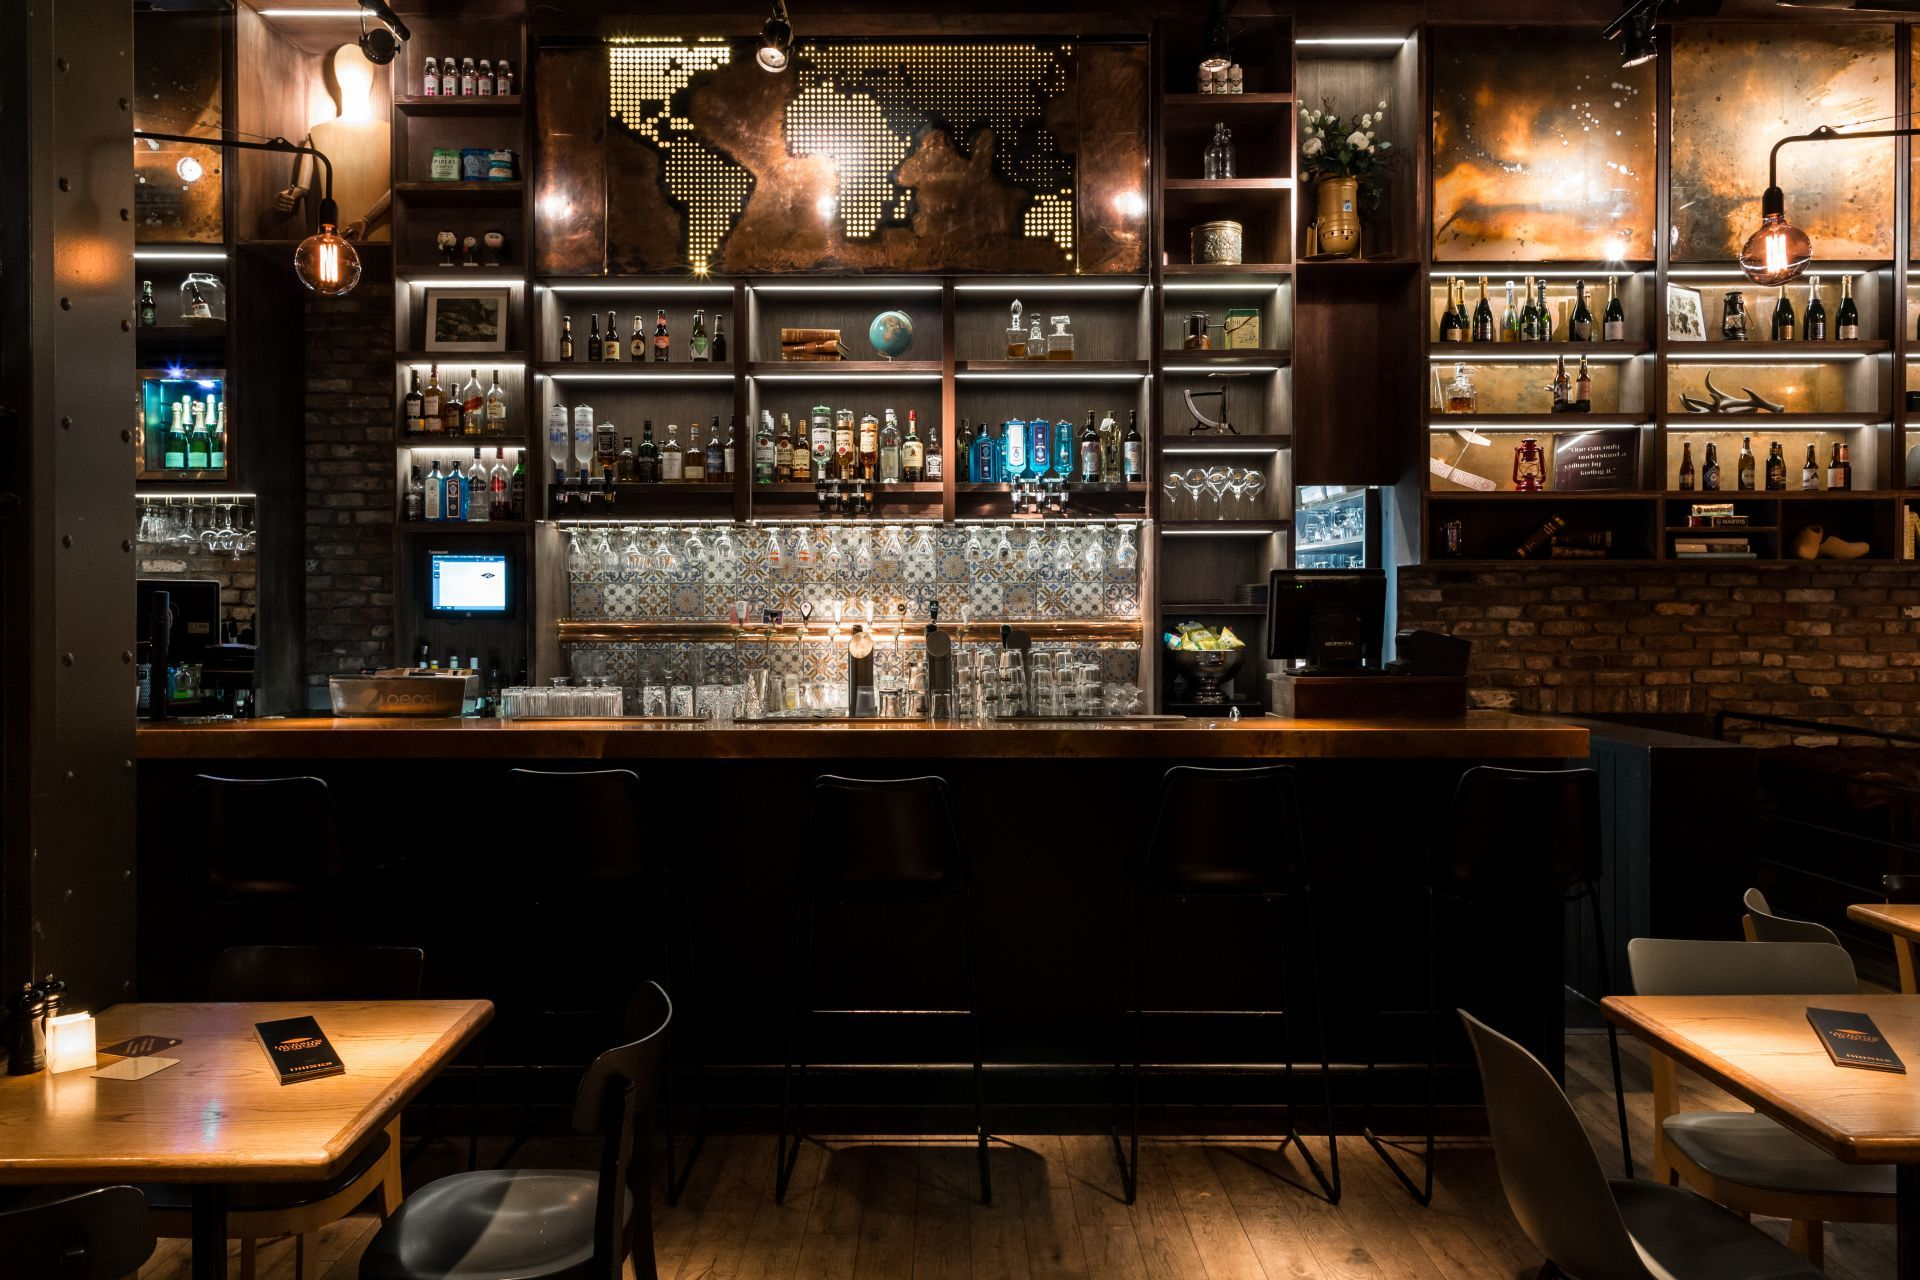 Enzo architectuur & interieur ® switch van caffe esprit naar jackson